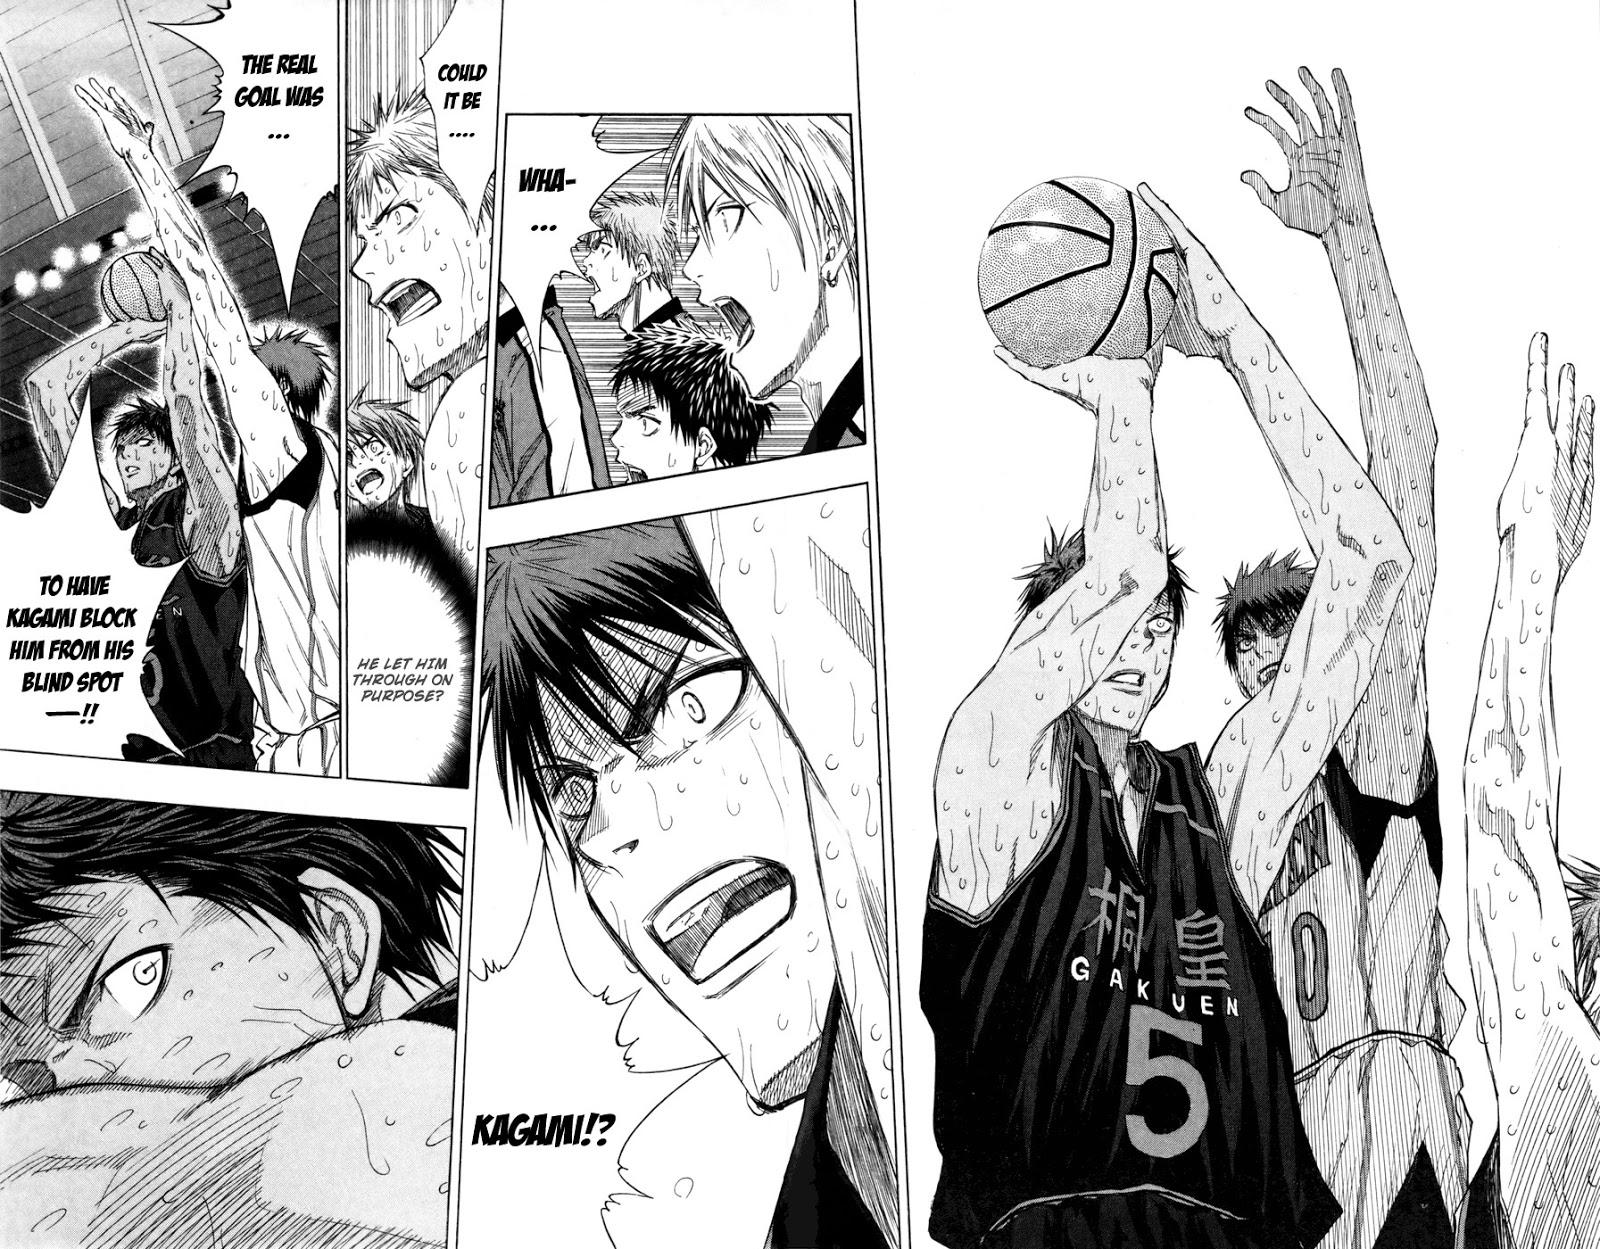 Kuroko no Basket Manga Chapter 132 - Image 07-07